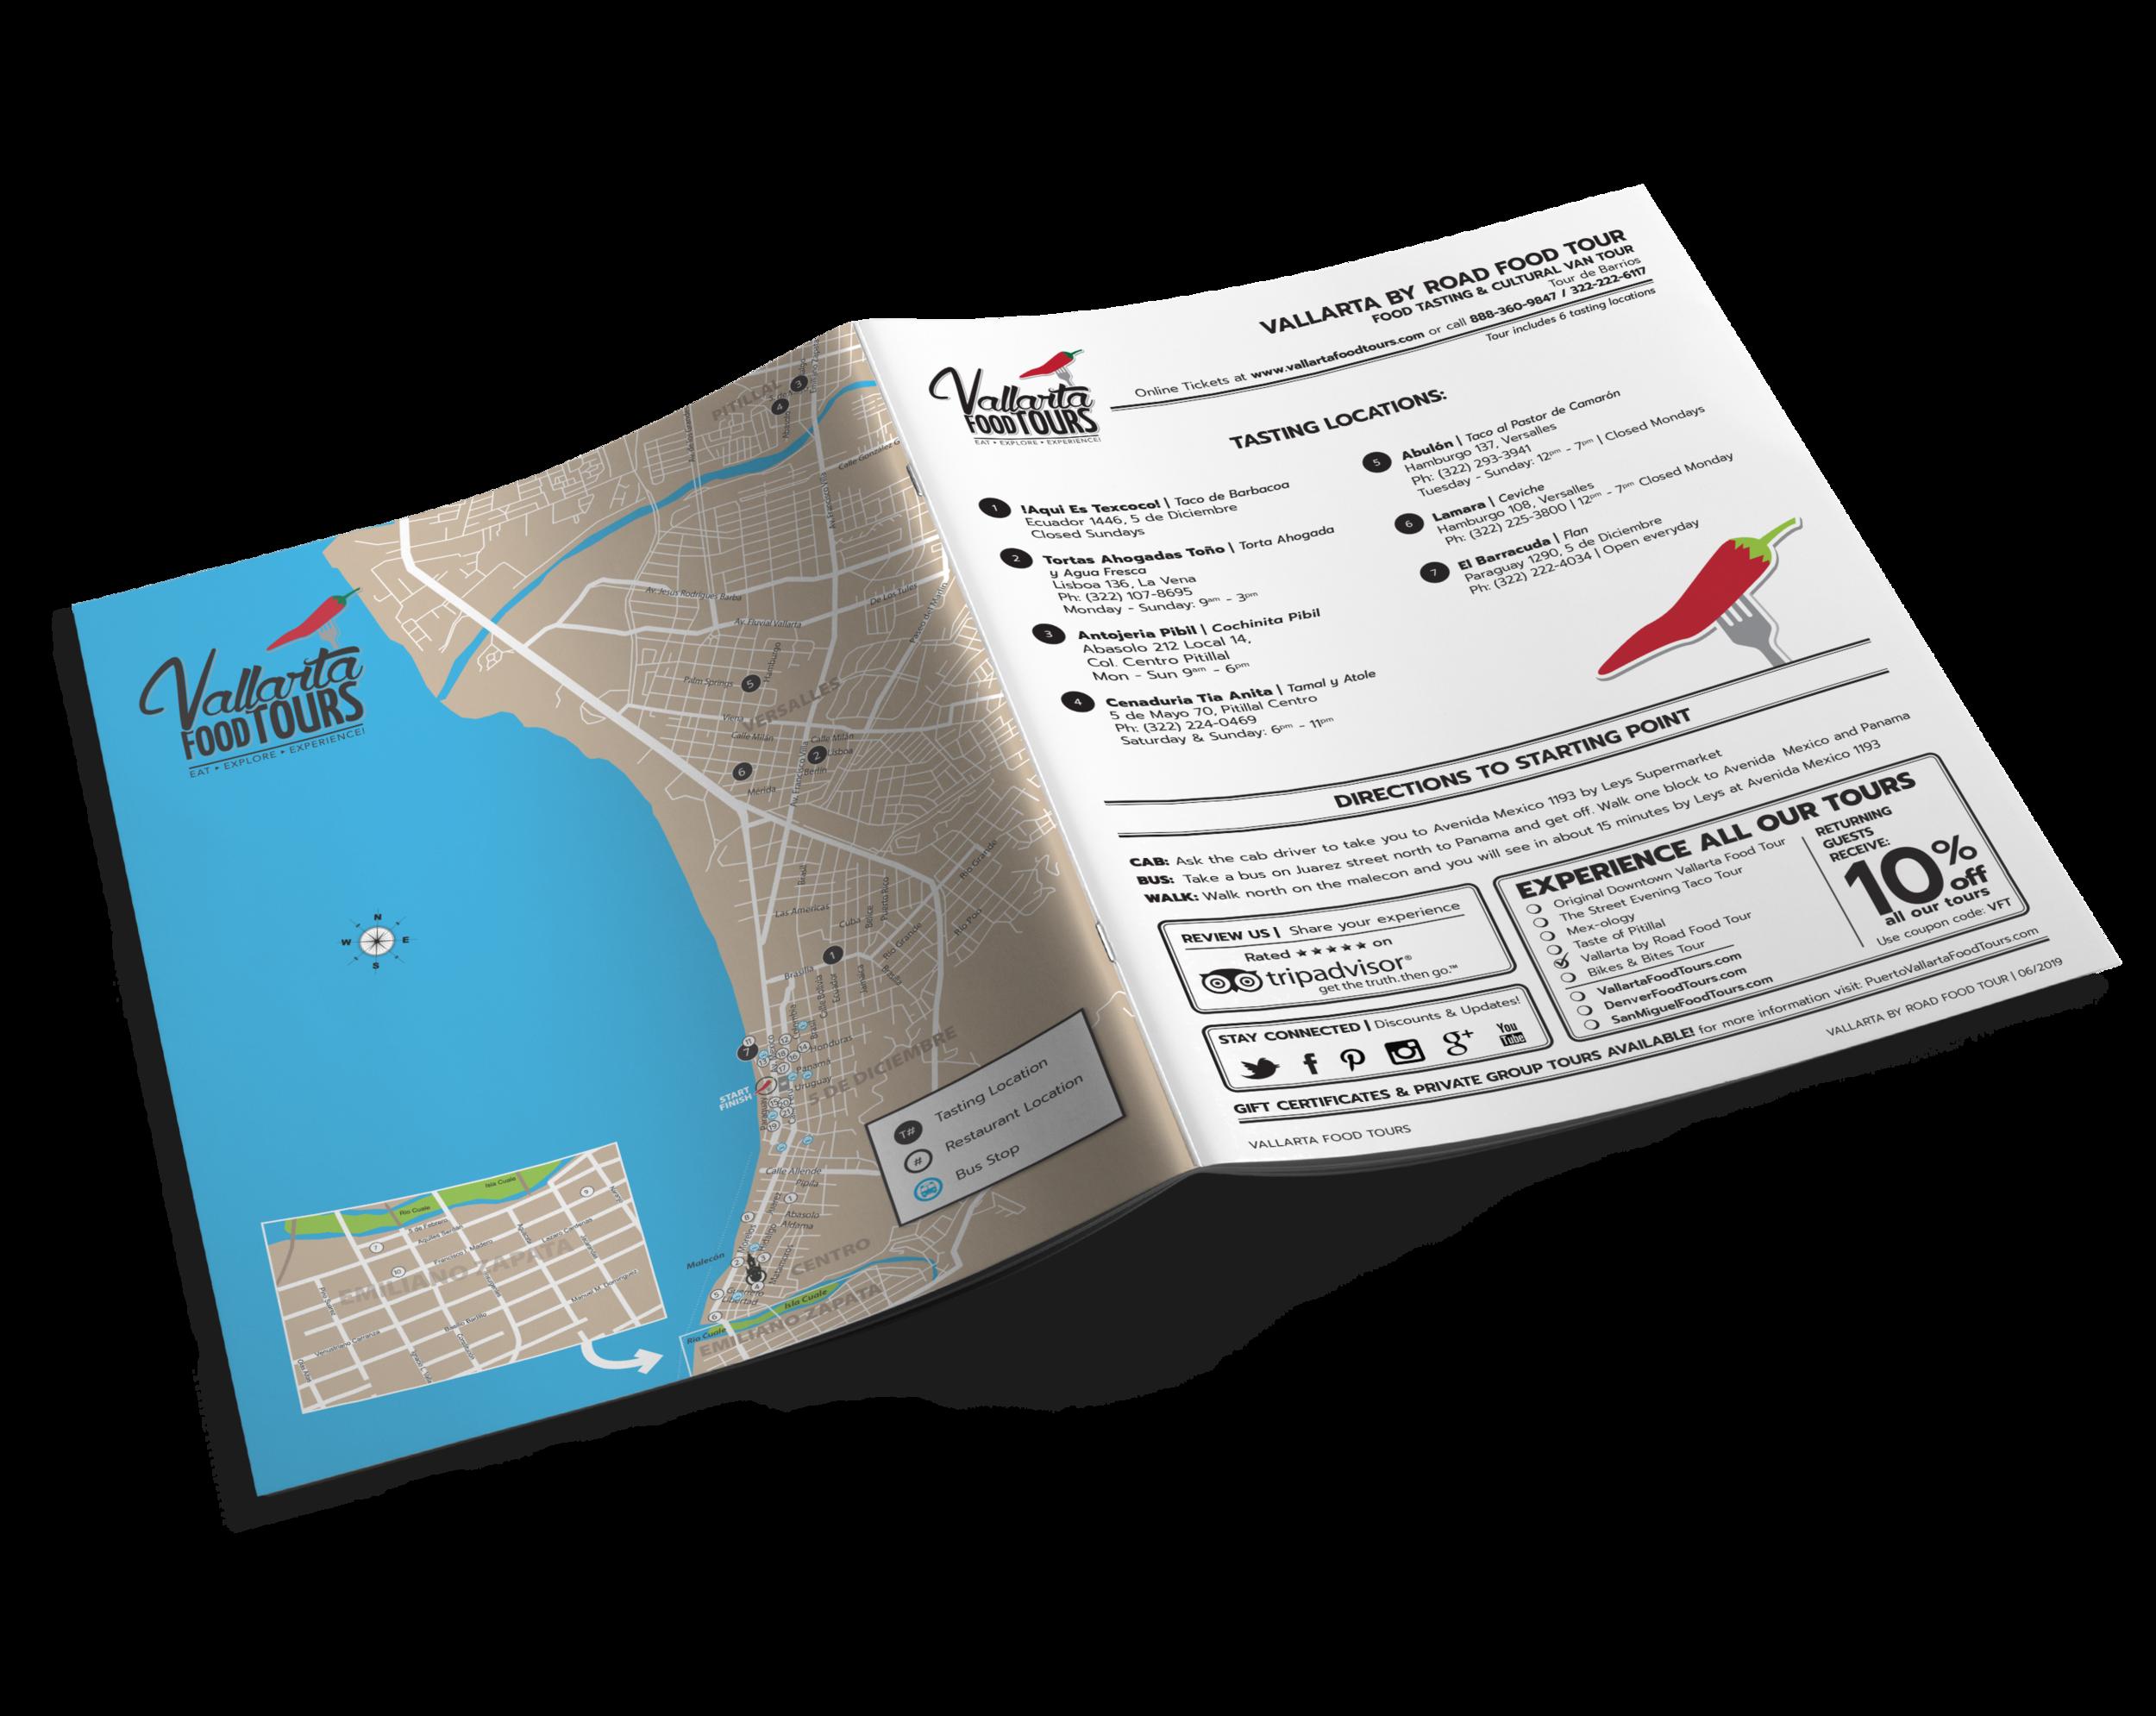 food-tour-booklet-custom-map-design.png